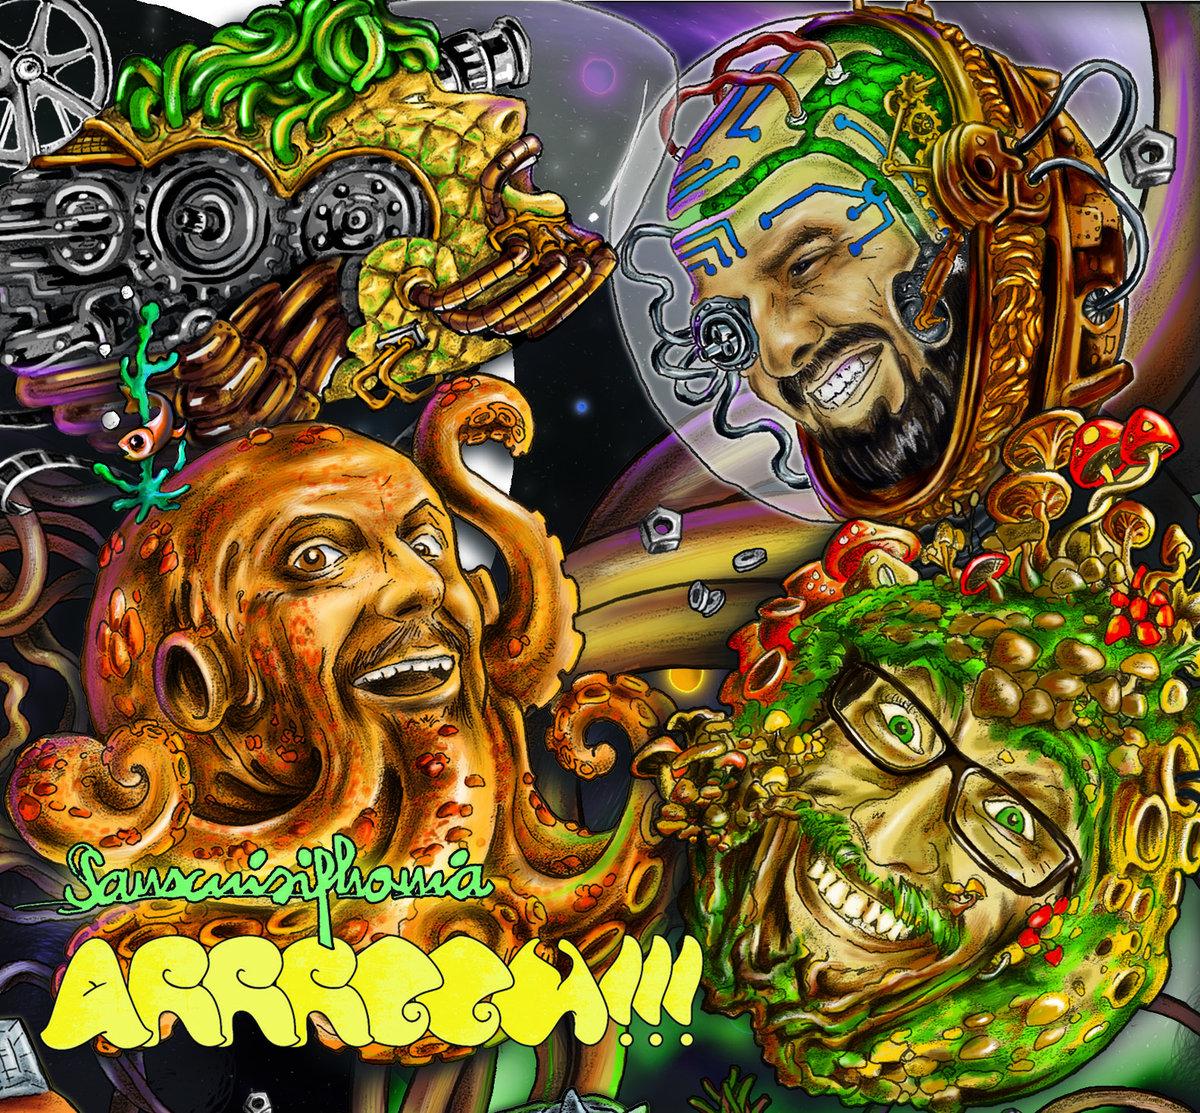 Arrrggh! - Sanscuisiphonia